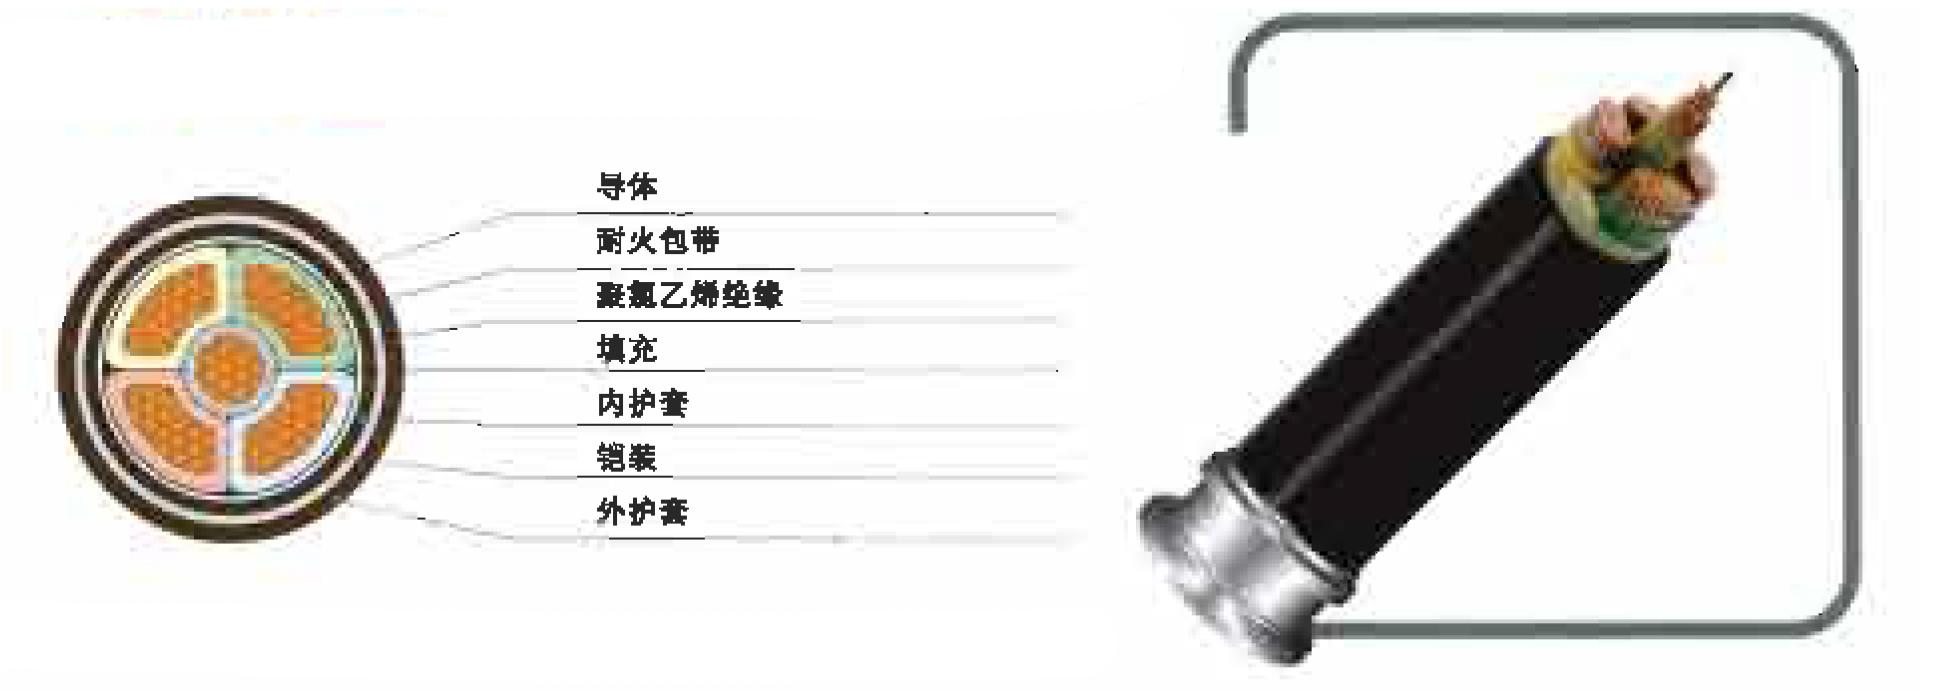 0.6/1KV交联聚乙烯雷竞技pc版耐火电力雷竞技官网下载